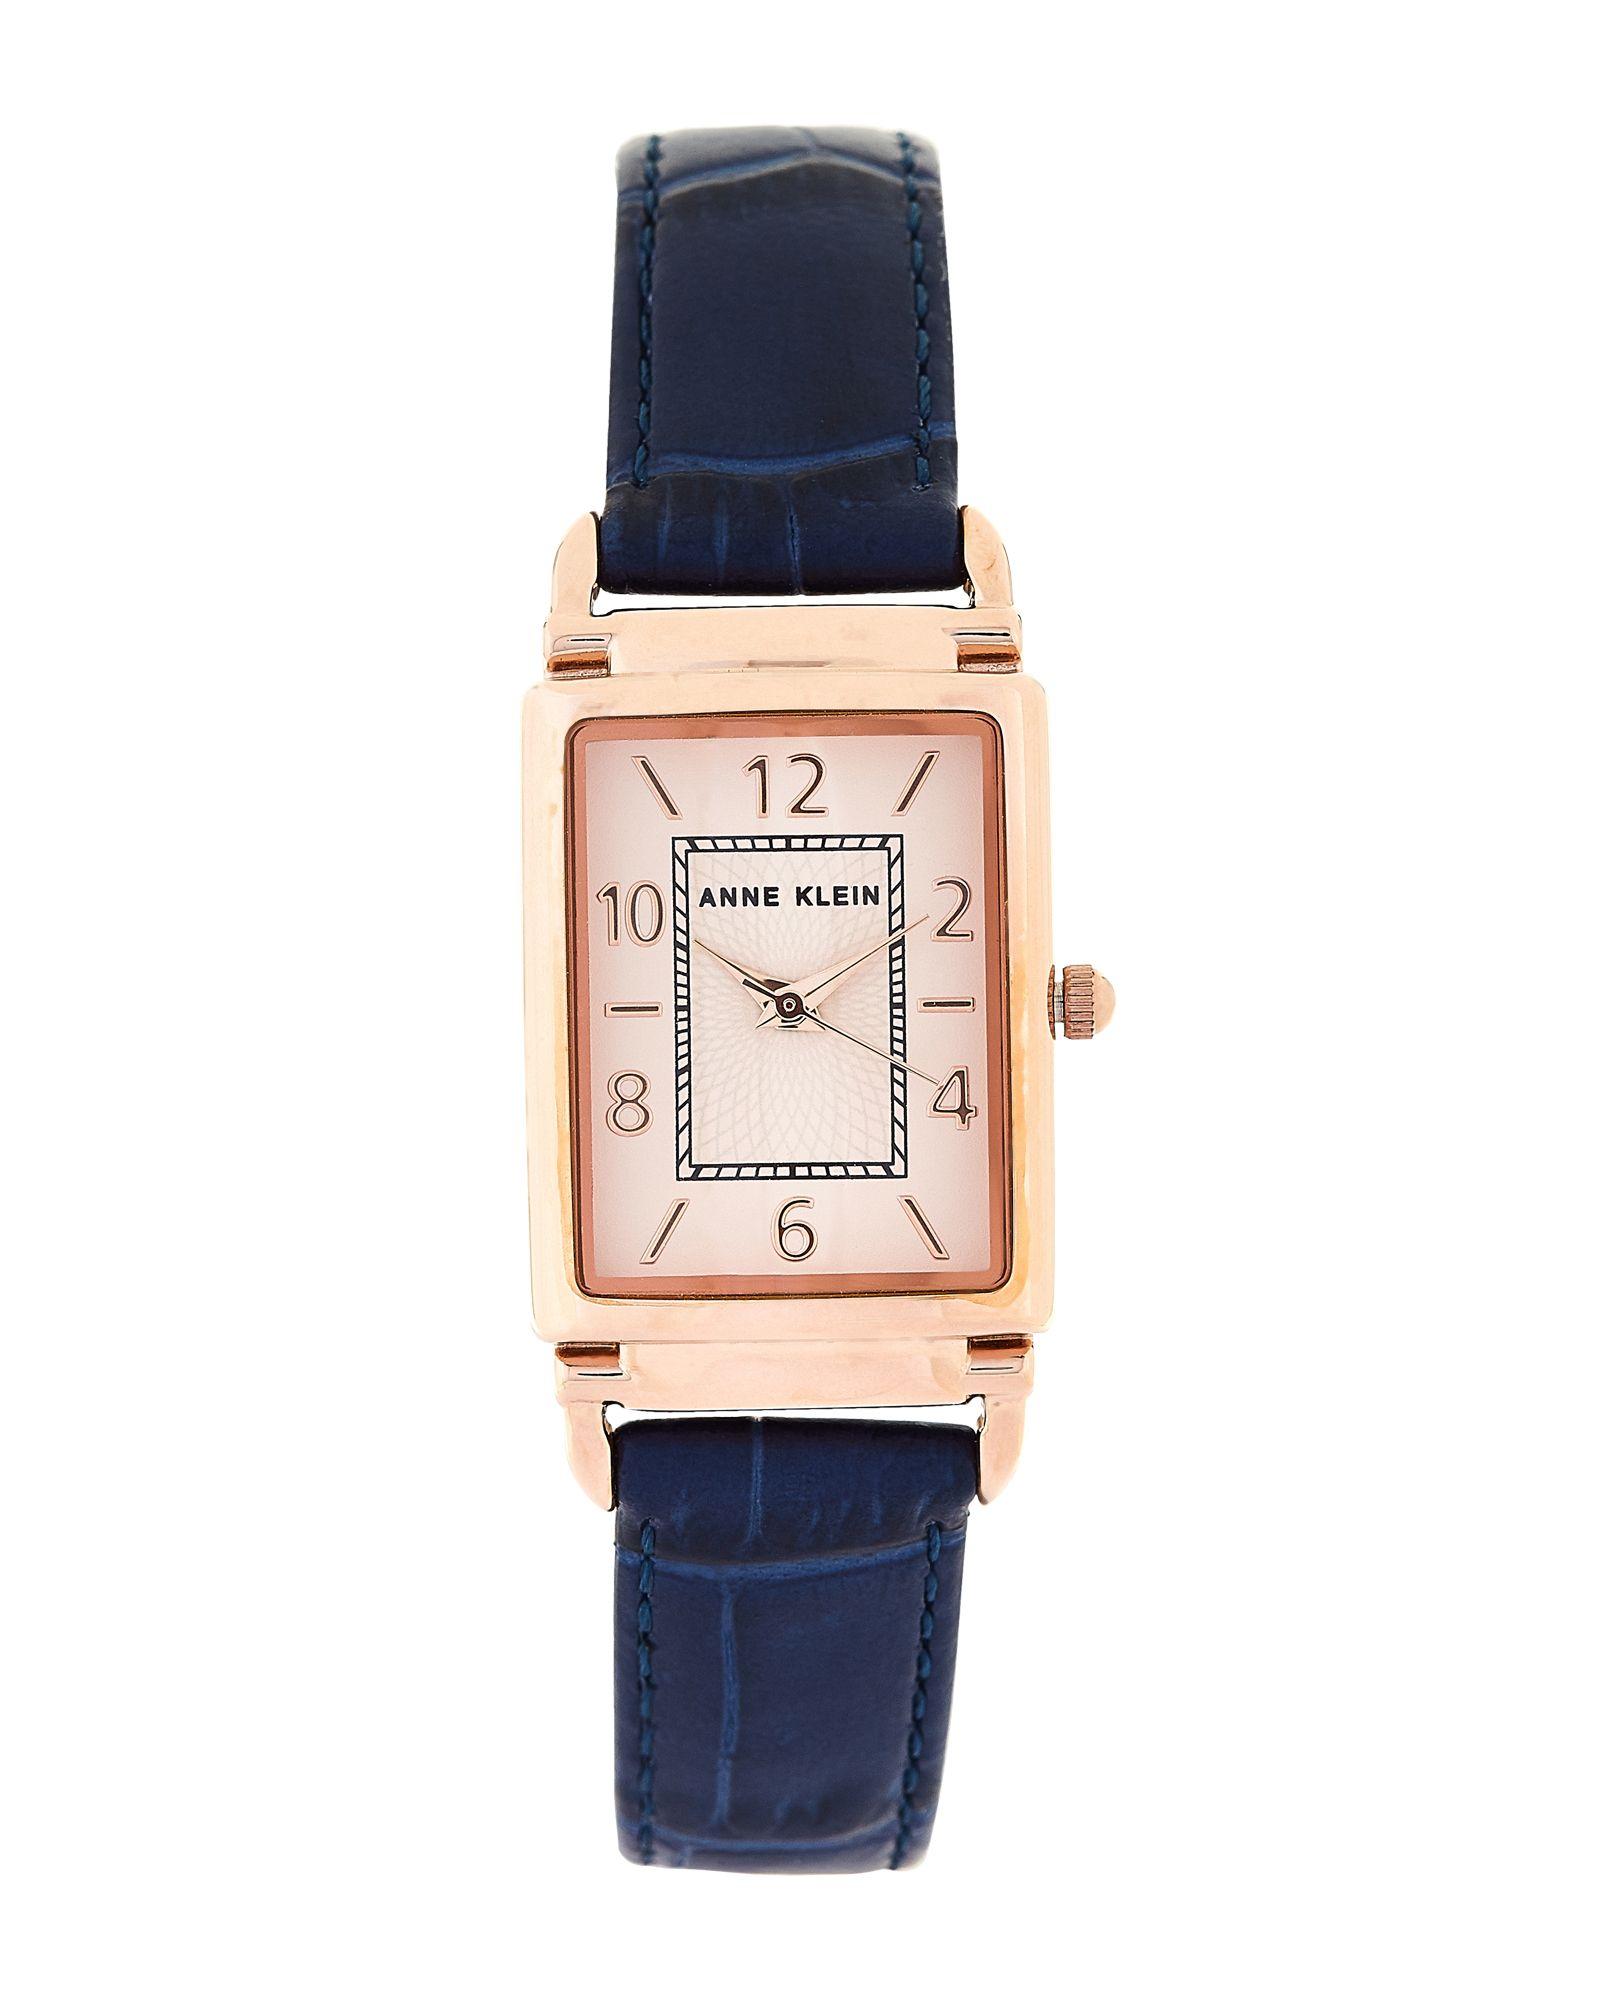 Anne Klein Ak2394 Rose Gold Tone Blue Leather Watch